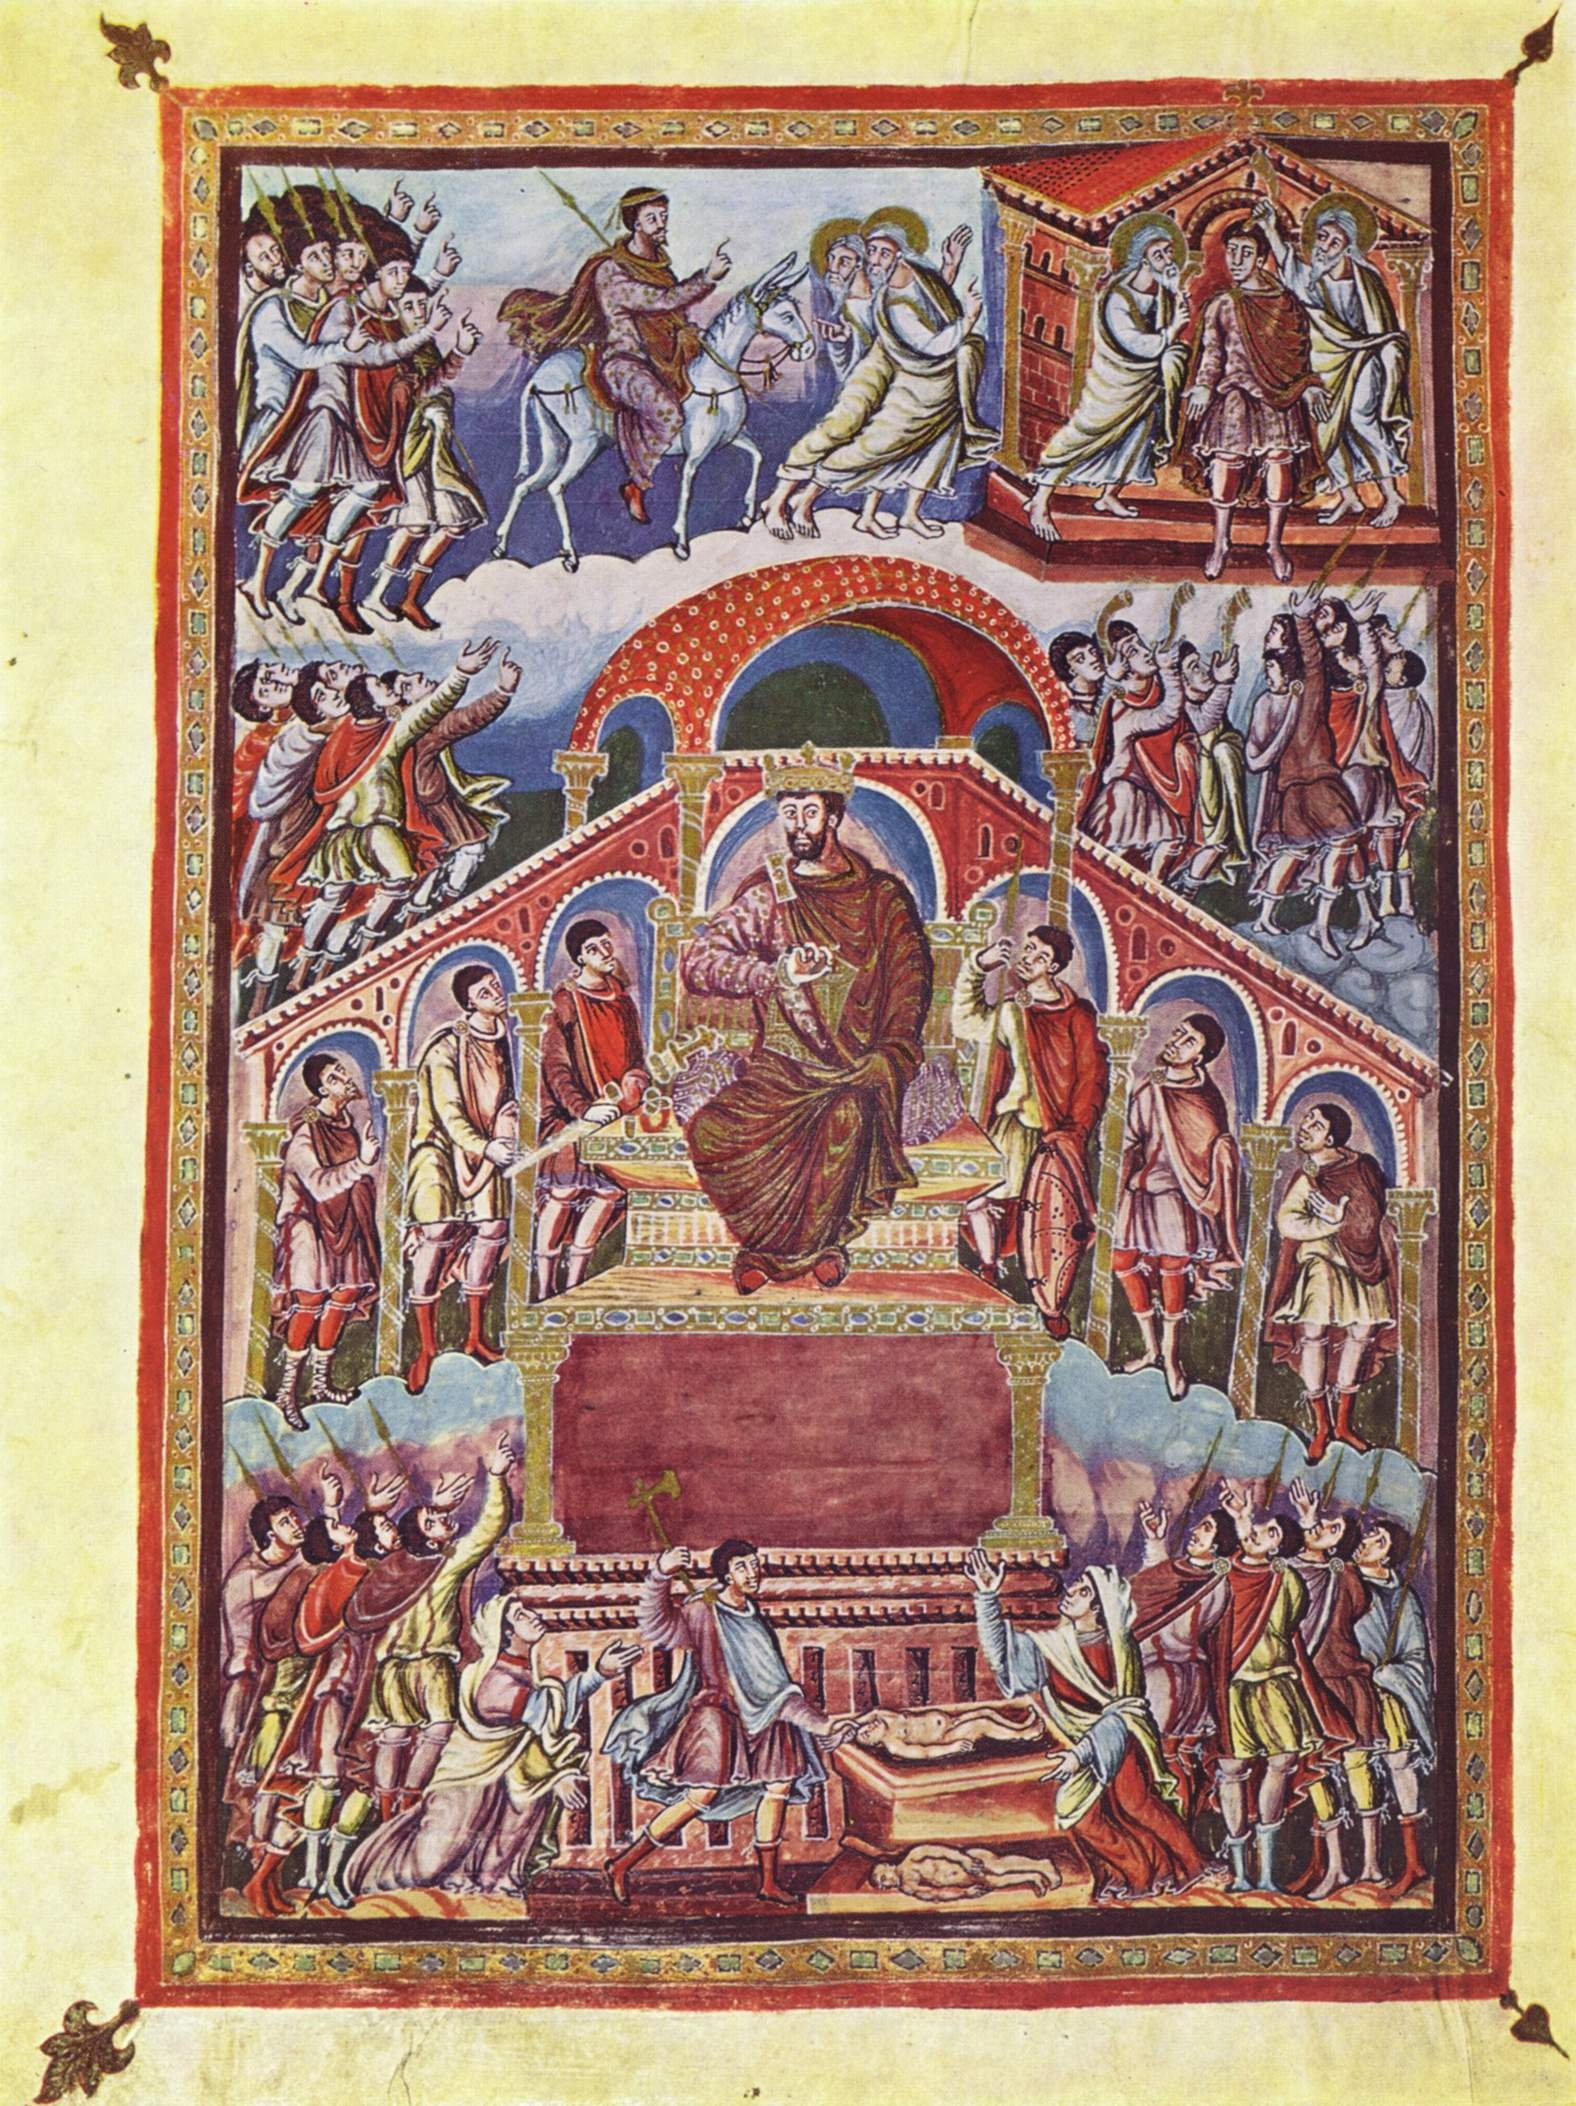 King Solomon's royal court.